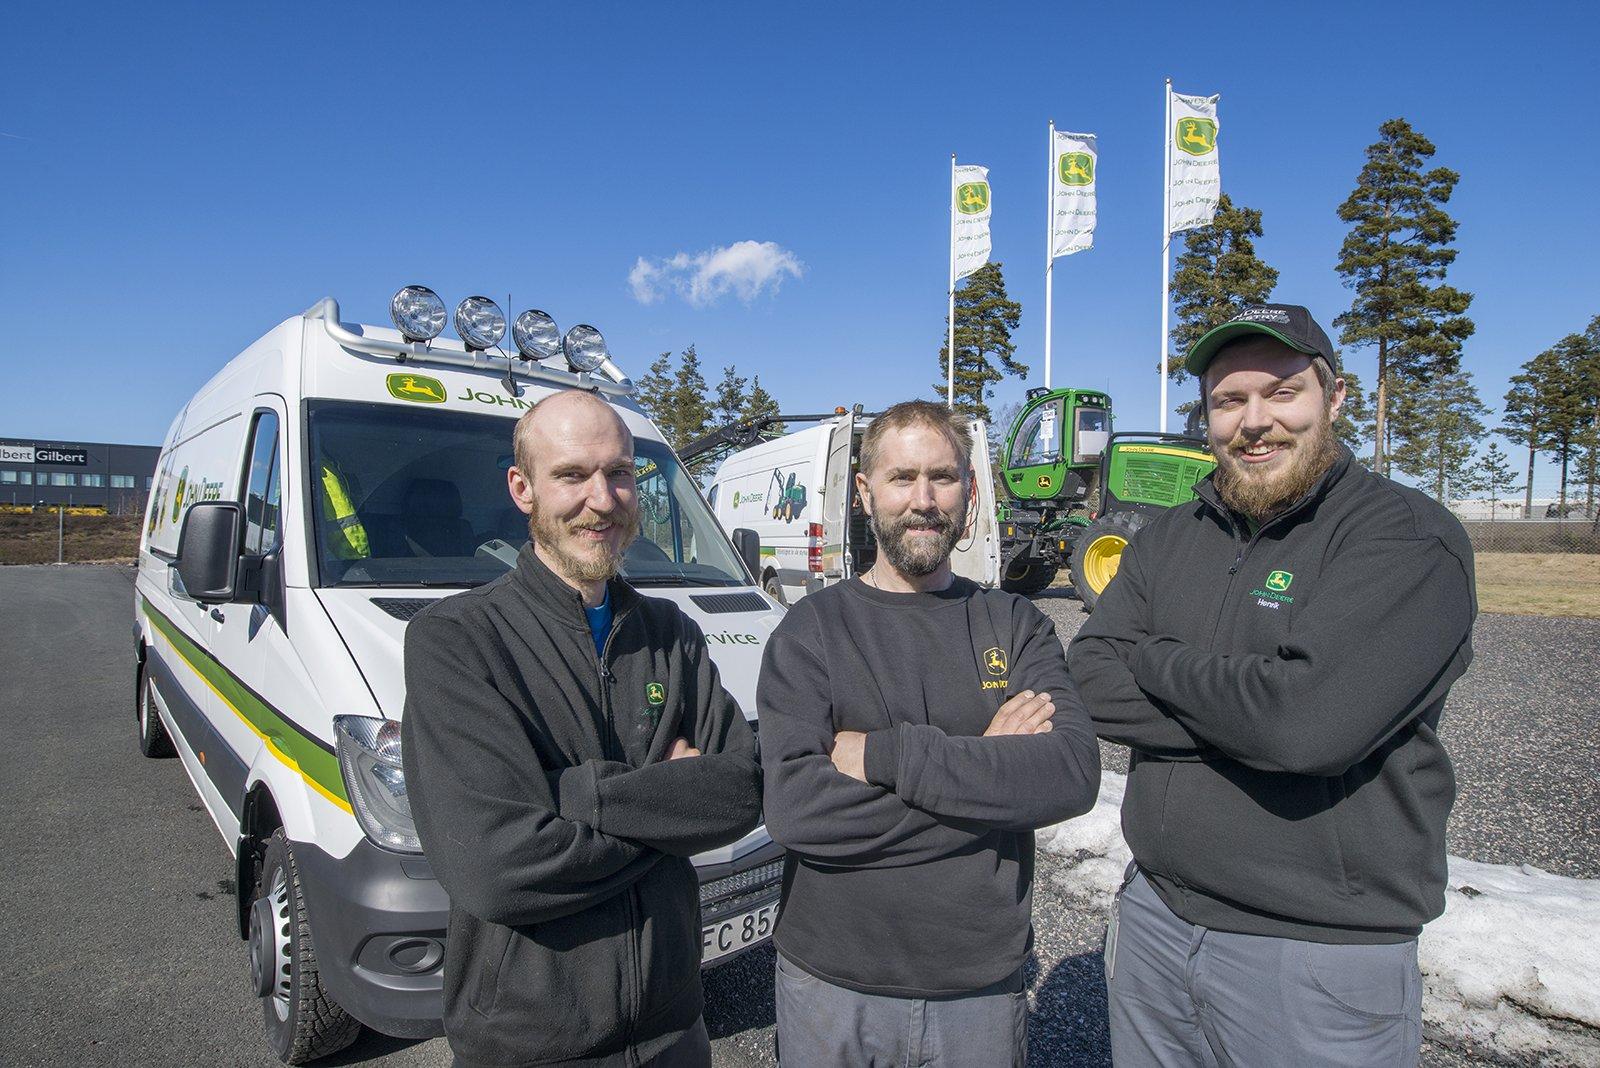 Tre medarbetre på John Deere Forestry – fr v Anthon Randau, Andreas Axelsson och Henrik Fjelkner.